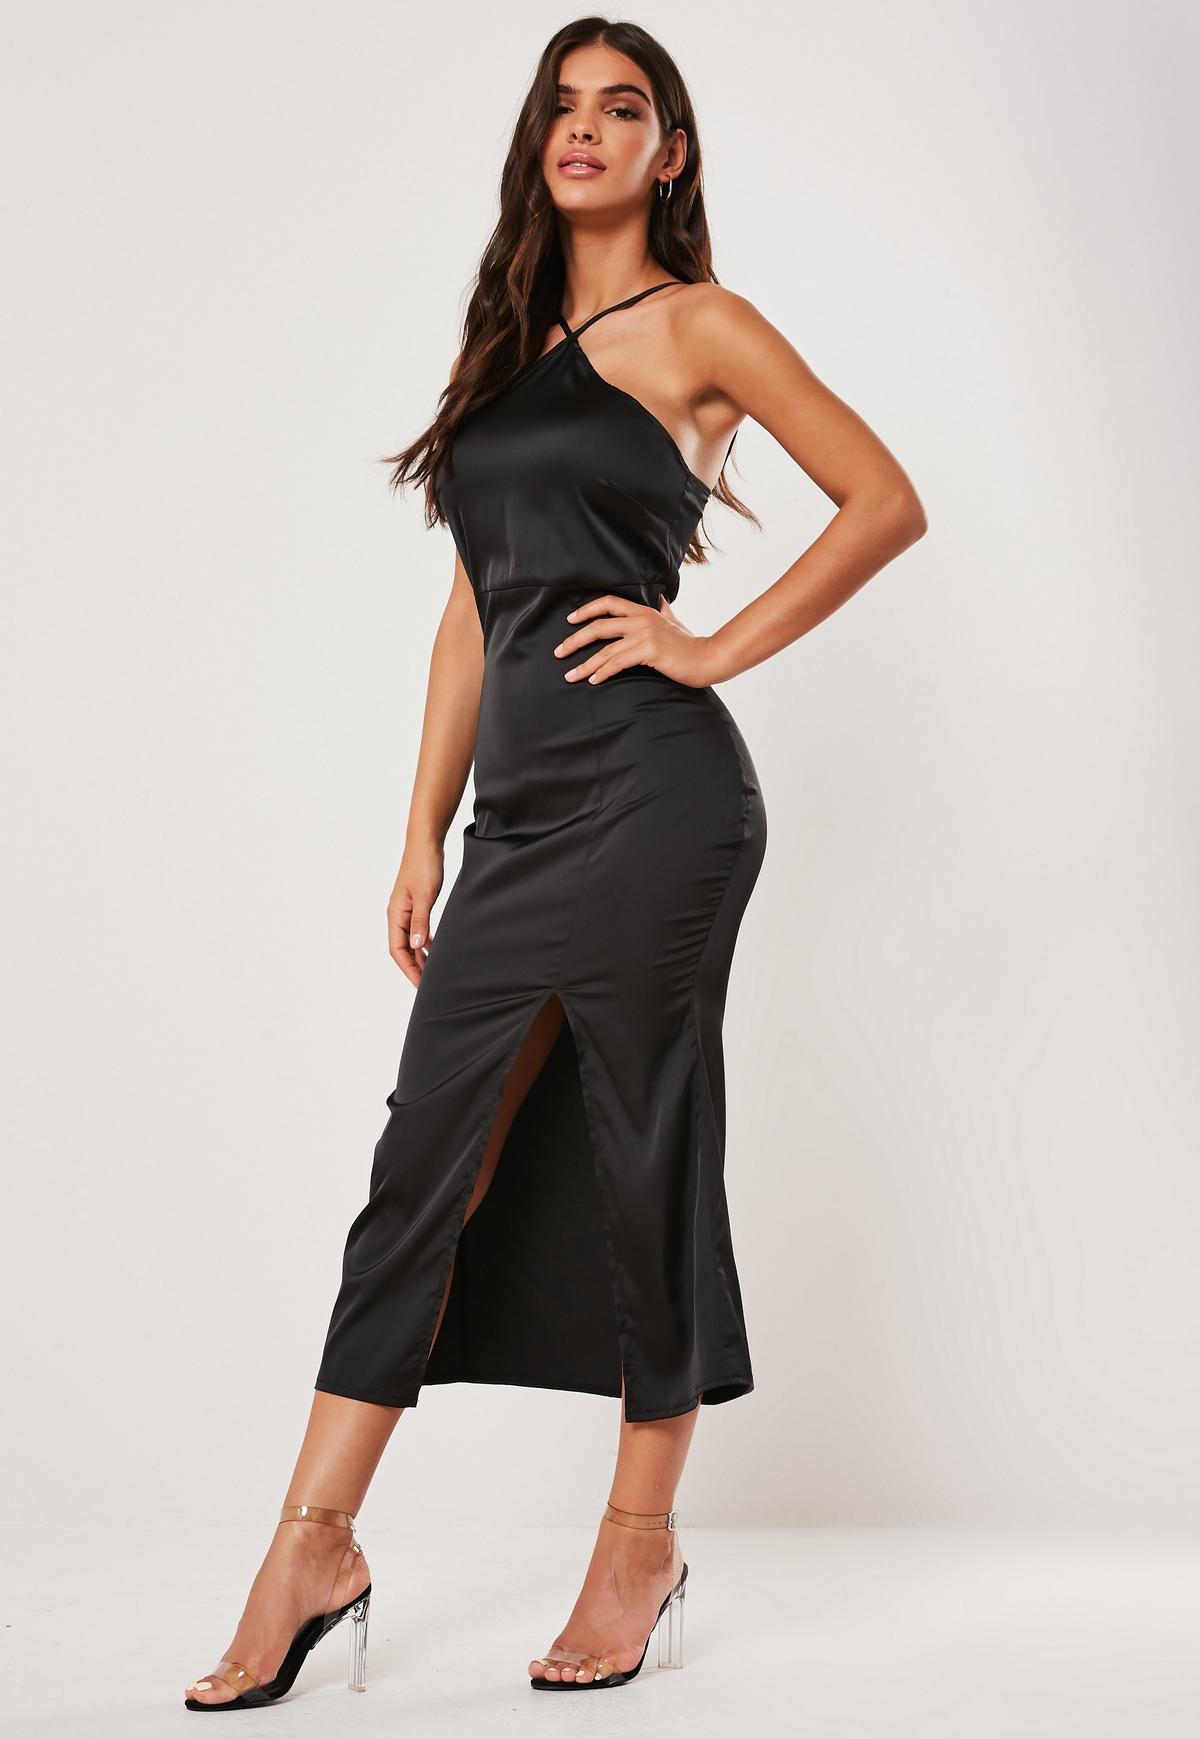 Black Satin Halter Neck Midi Dress Missguided Australia